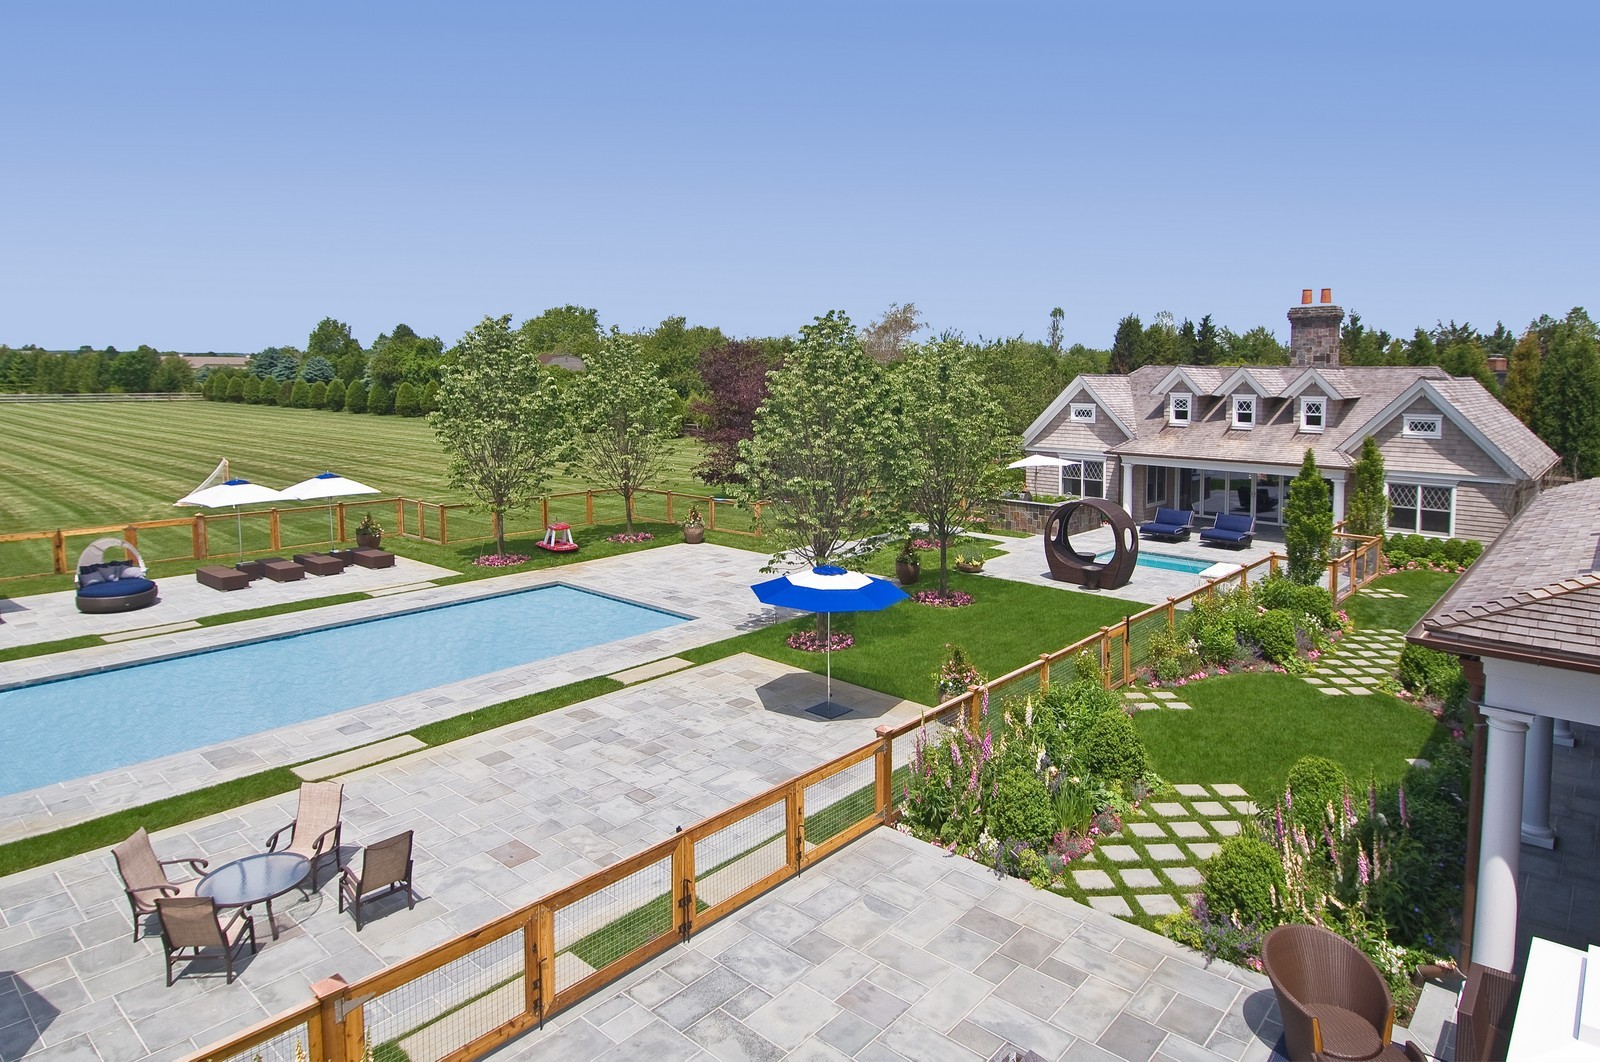 Real Estate Photography - 612 halsey lane, bridgehampton, NY, 11932 - View